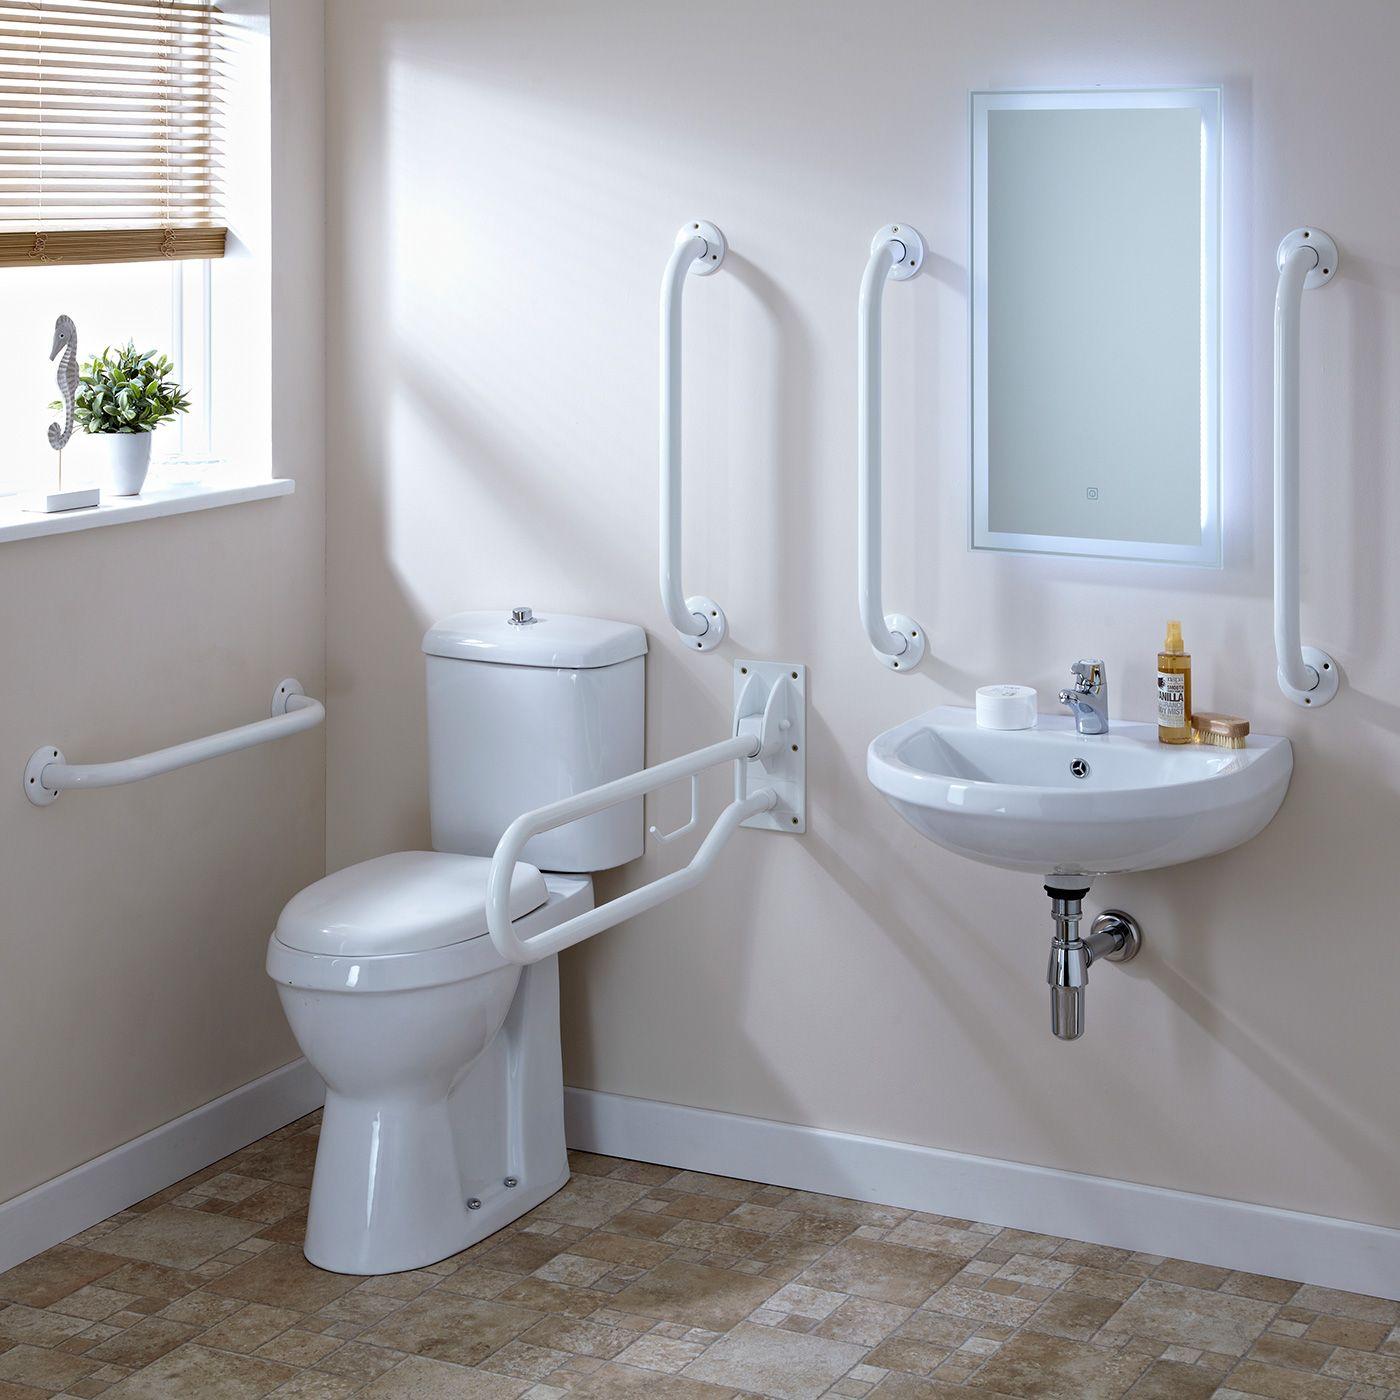 Premier White Doc M Pack Disabled Bathroom Toilet, Basin and Grab Rails